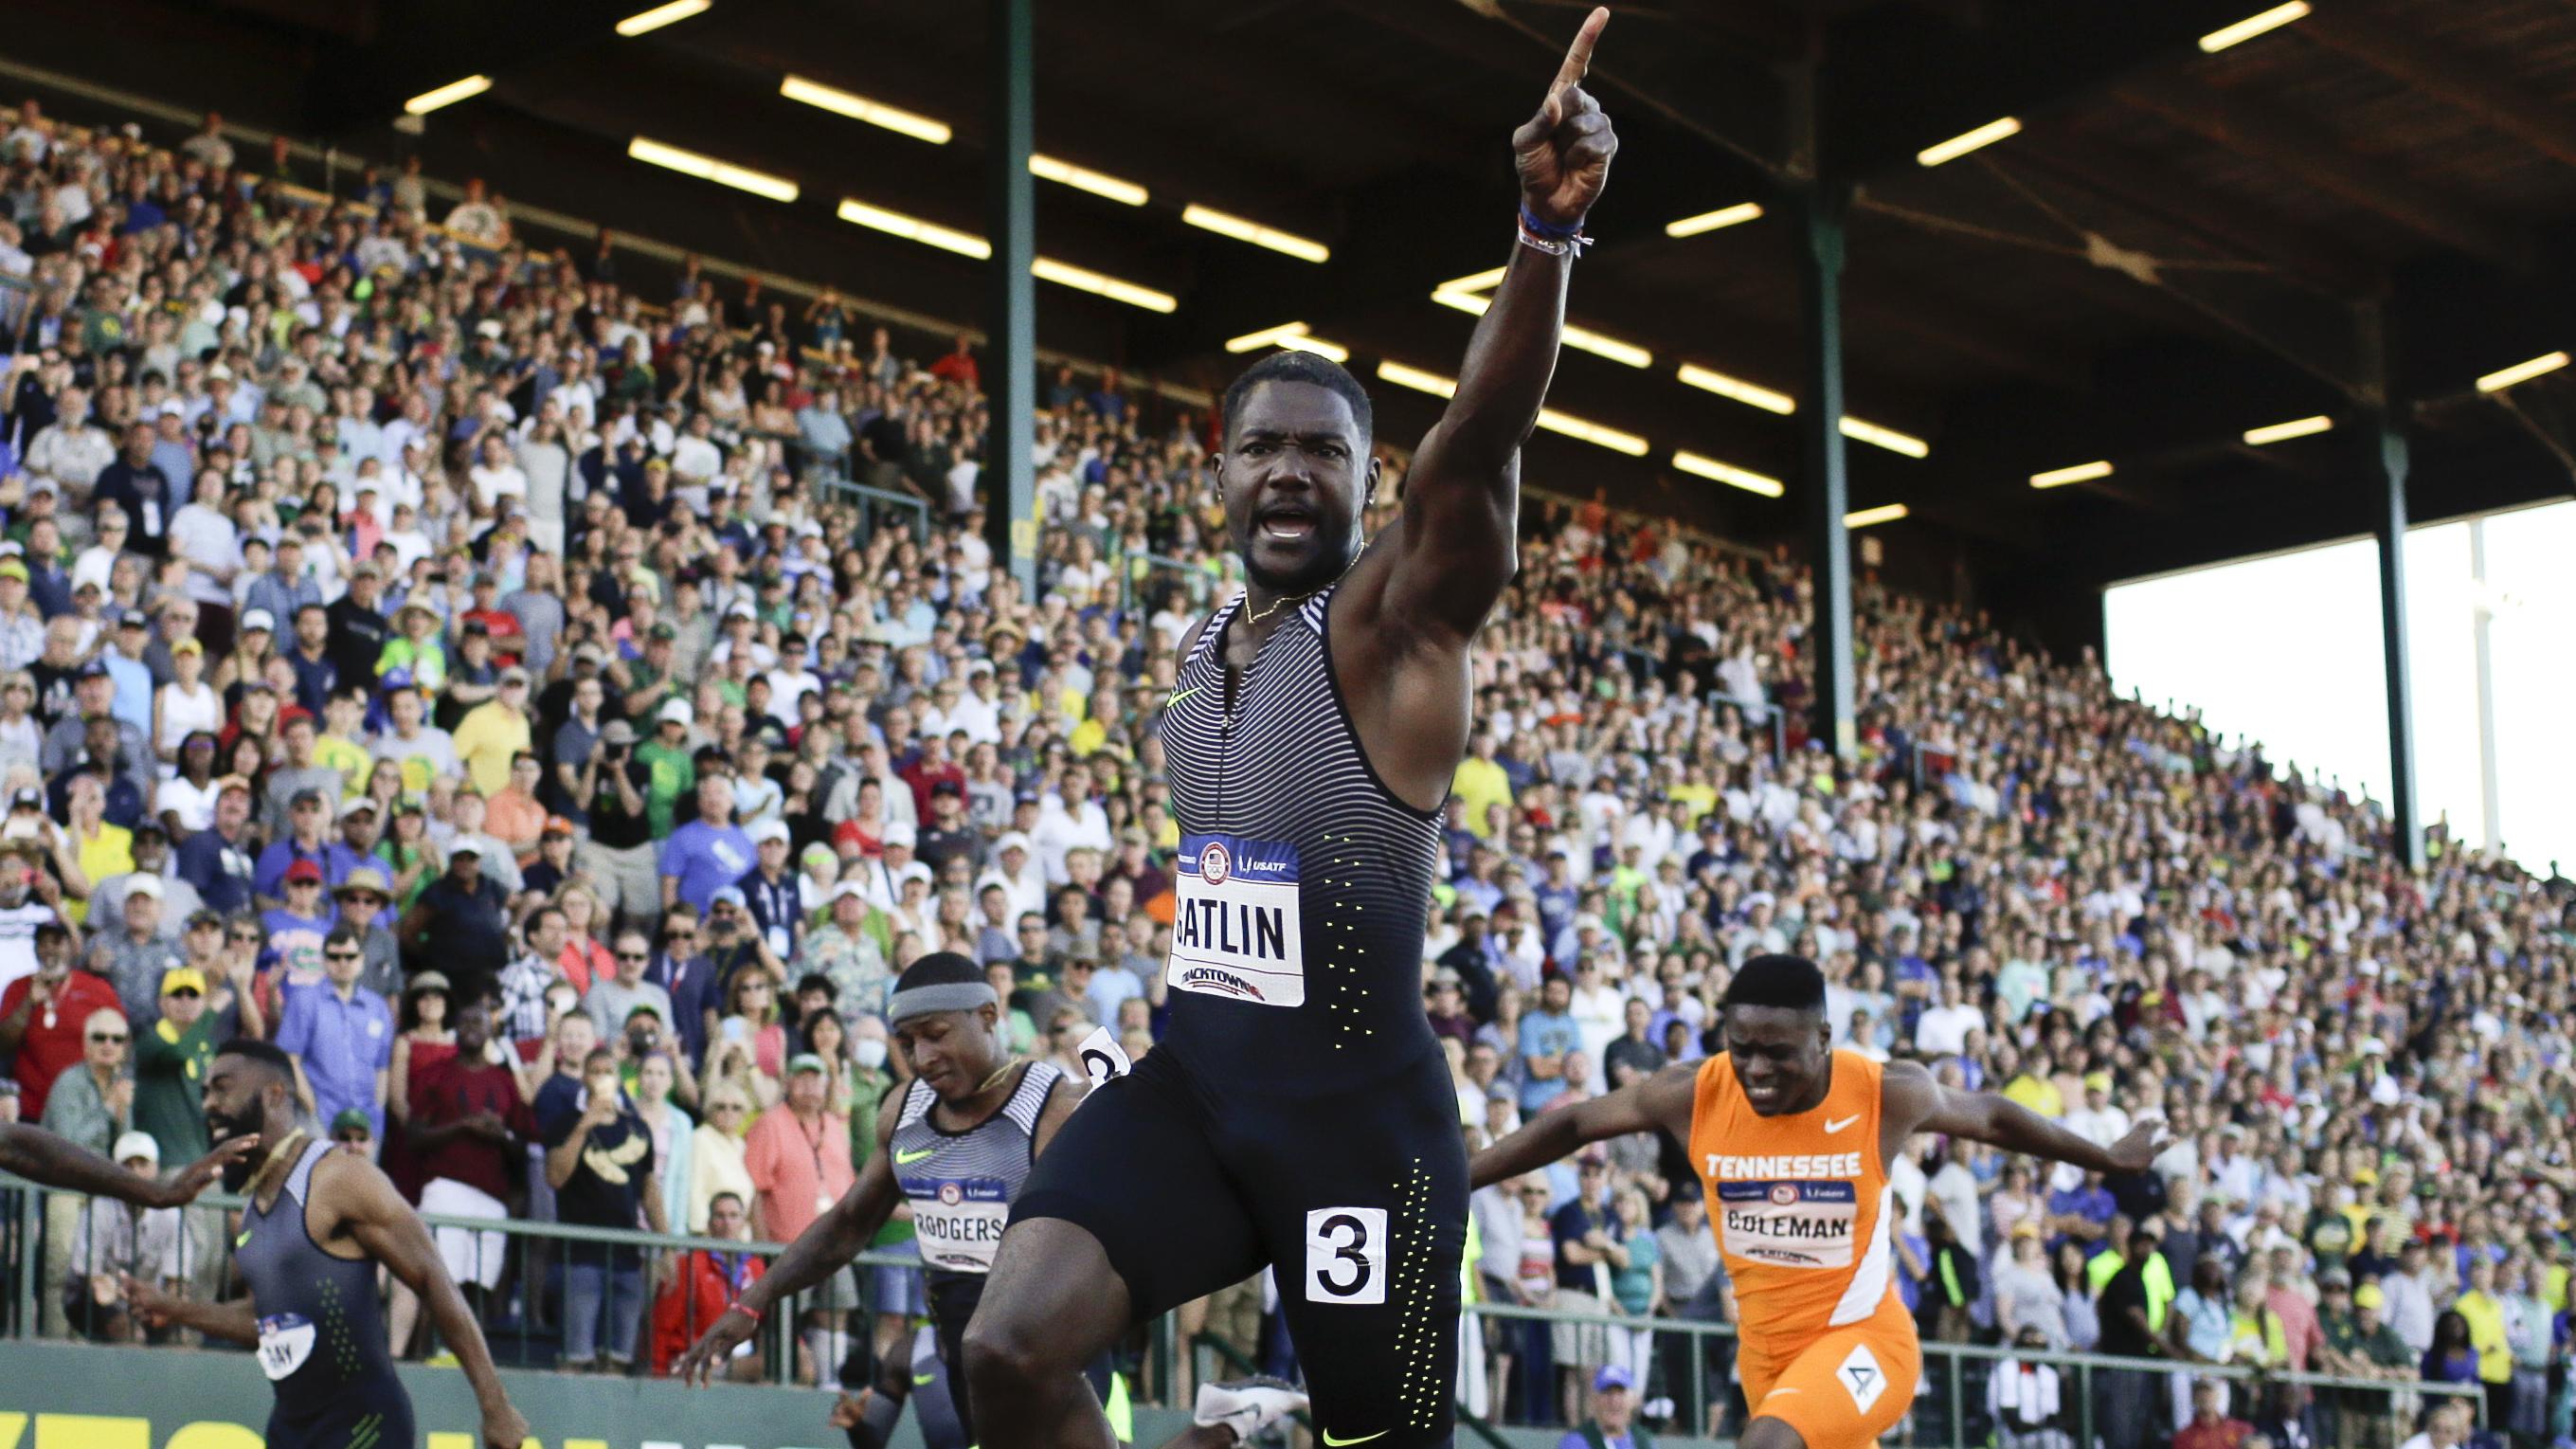 GATLIN_2016_APTOPIX US Track Trials Athletics